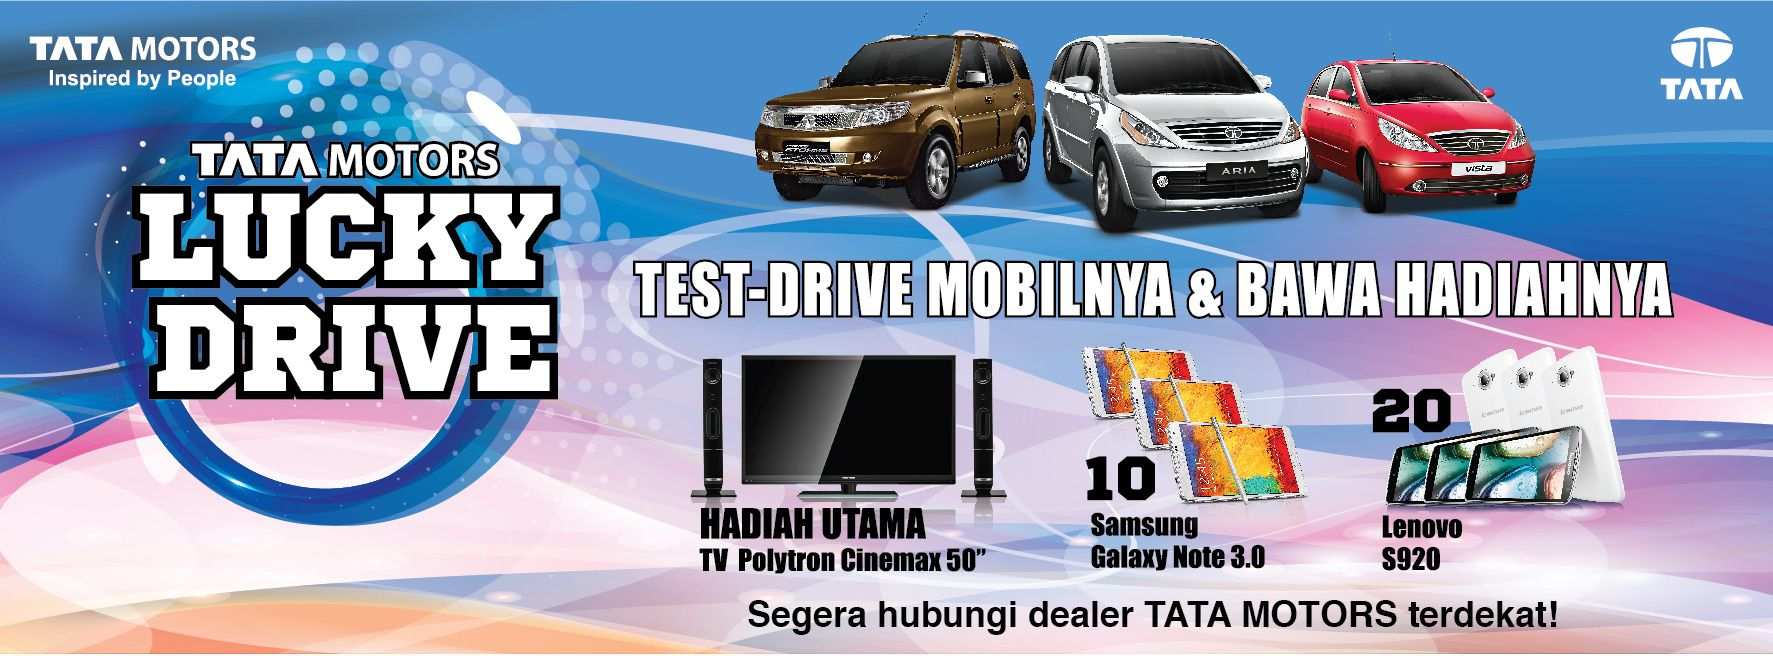 Pin di Tata Motors Indonesia Campaign